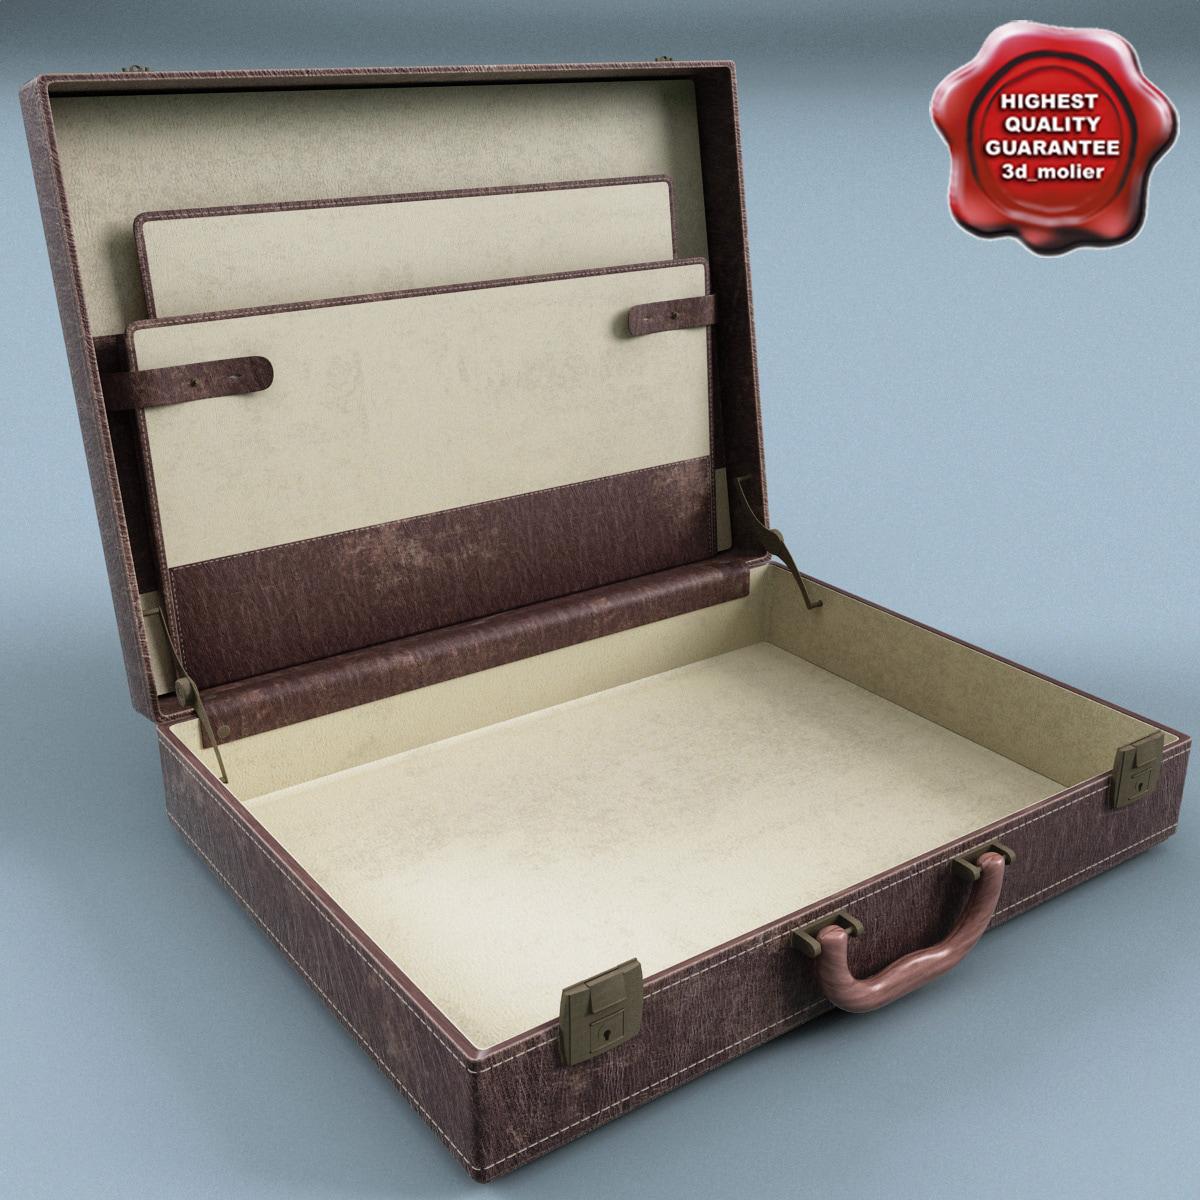 Suitcase_V3_00.jpg